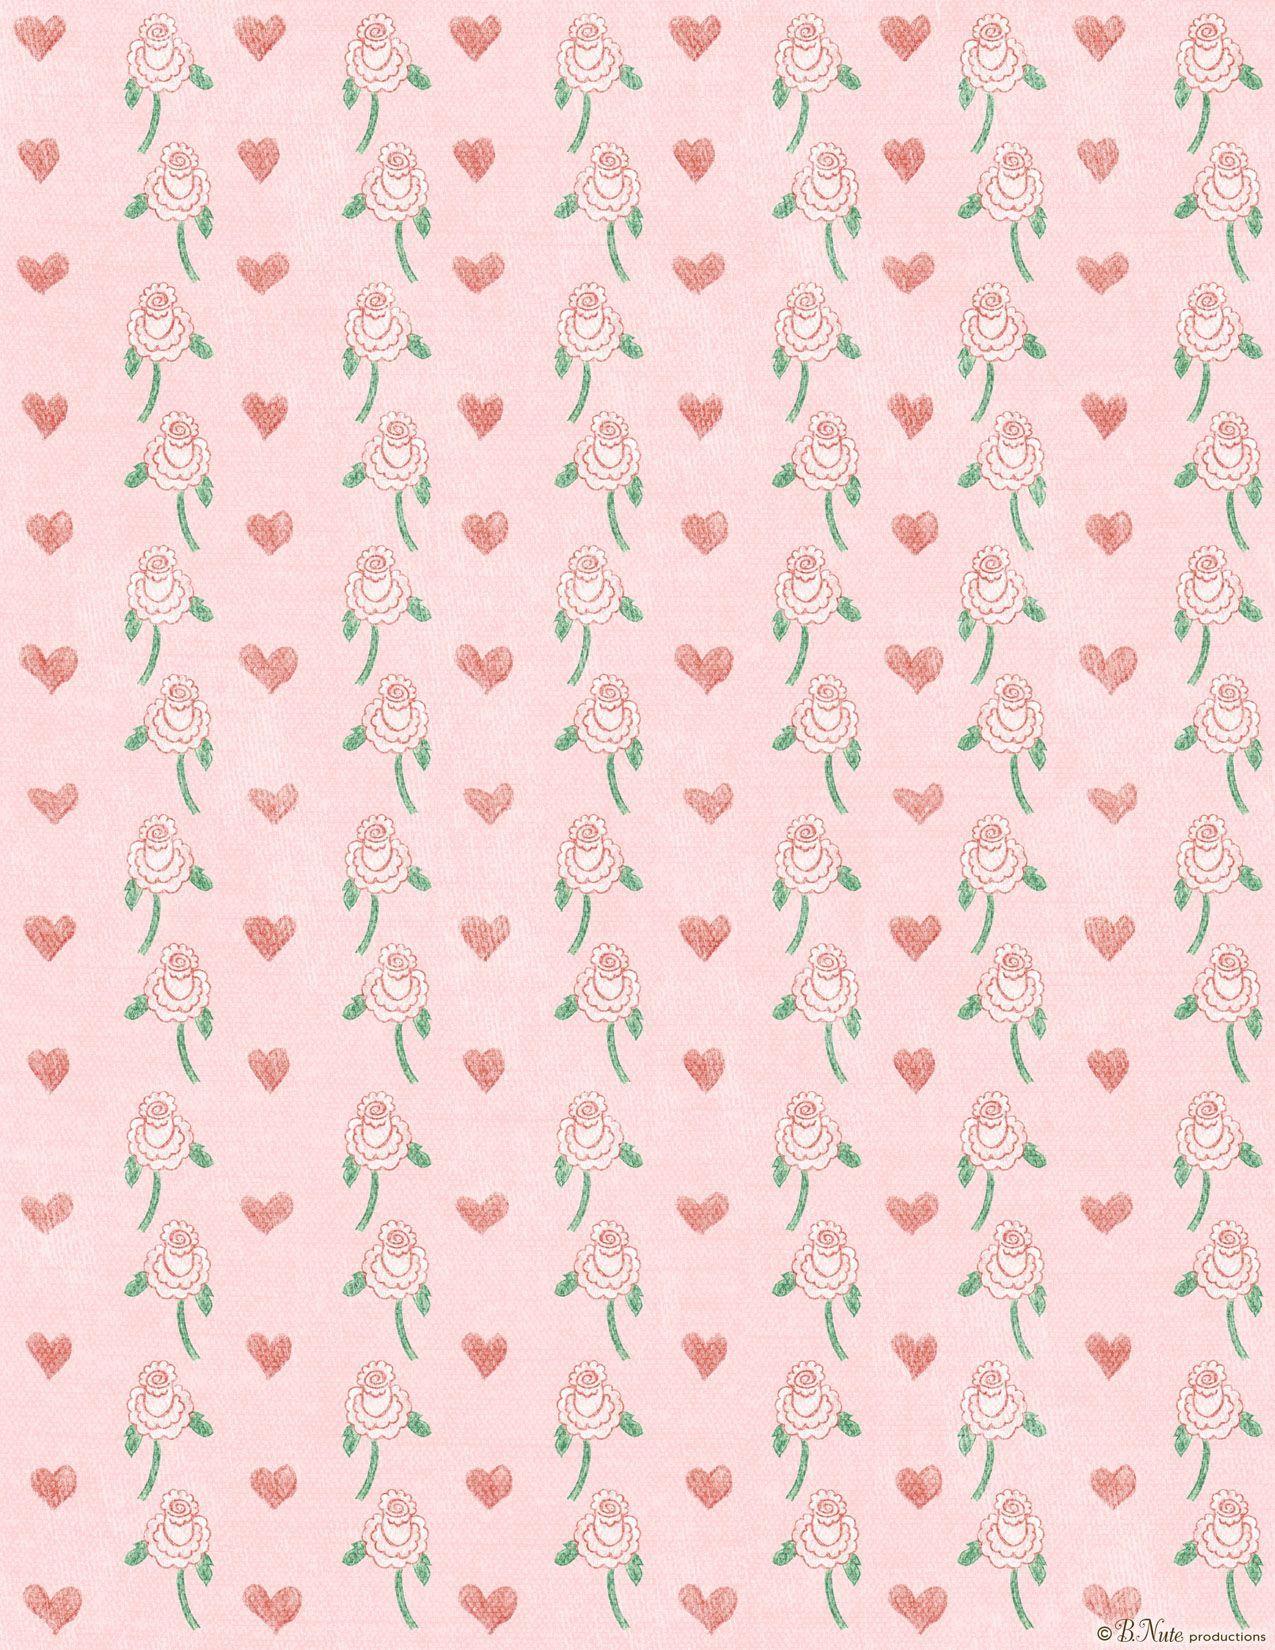 28 Elegant Image Of Scrapbook Backgrounds Printables - Free Printable Scrapbook Paper